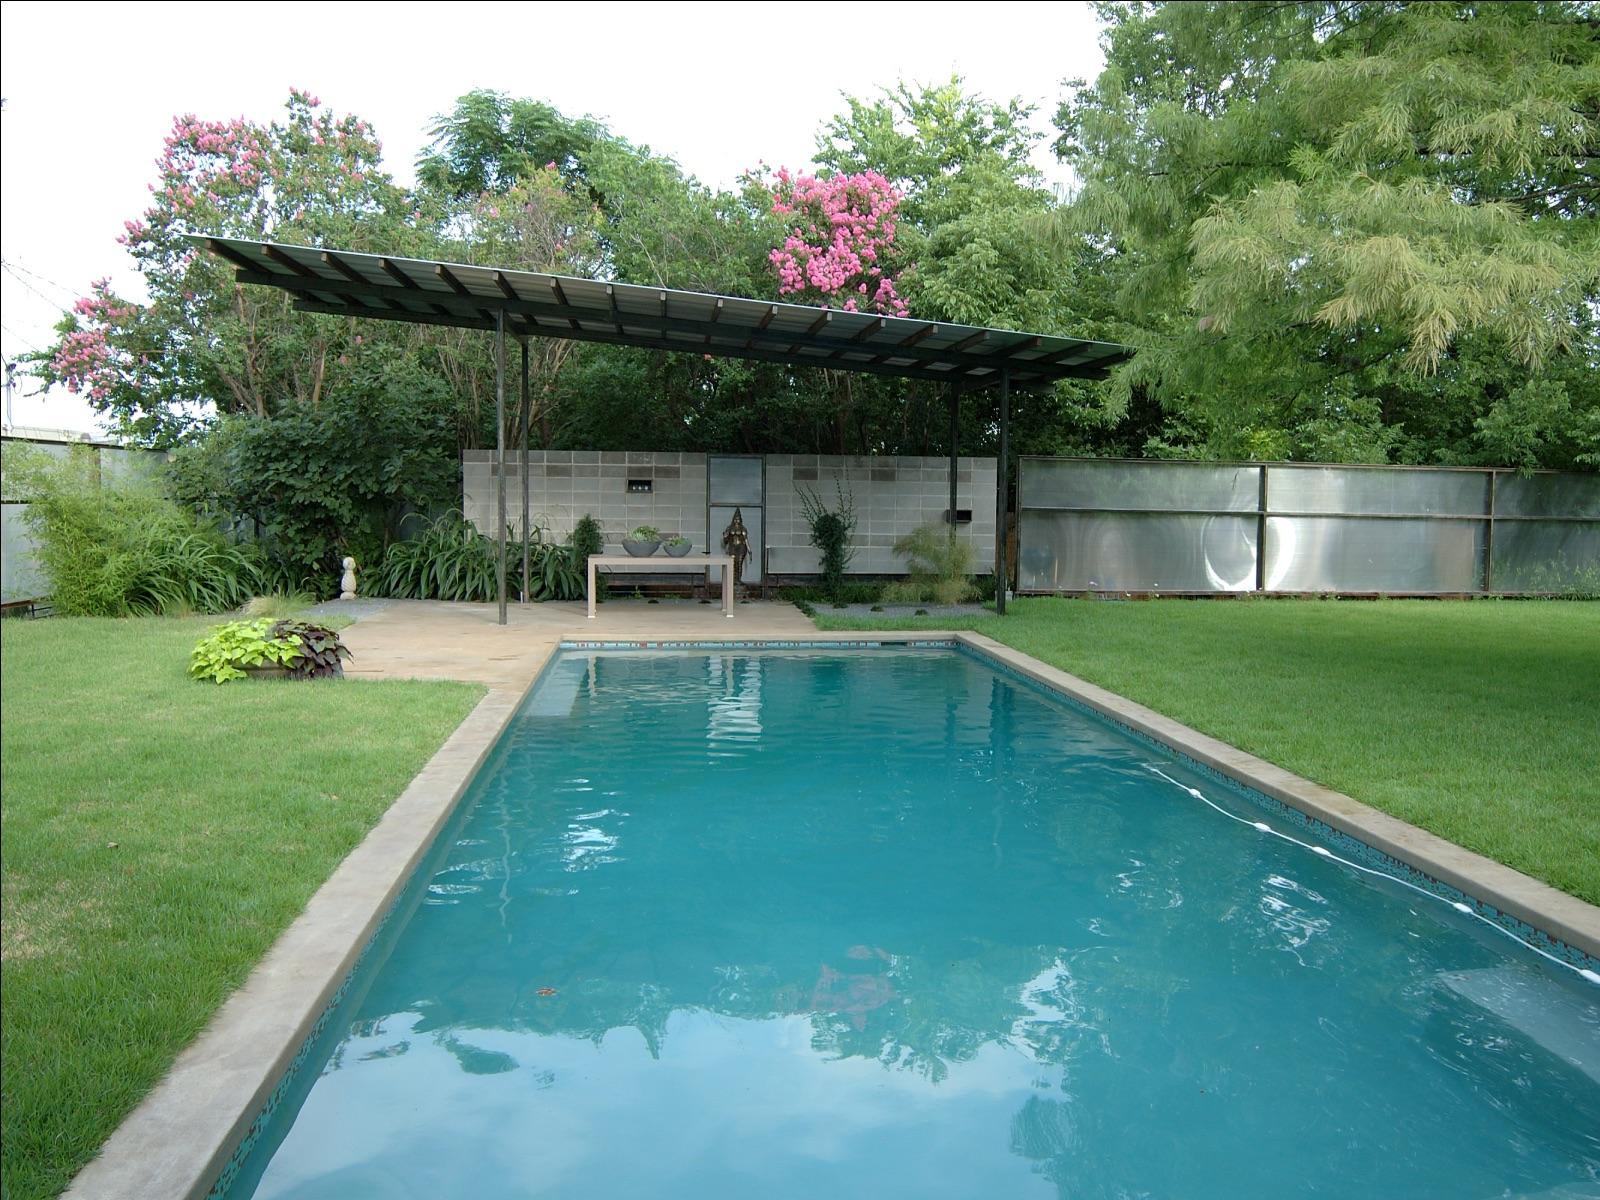 project-humphrey-place-pool-patio-panorama-1600x1200.jpg